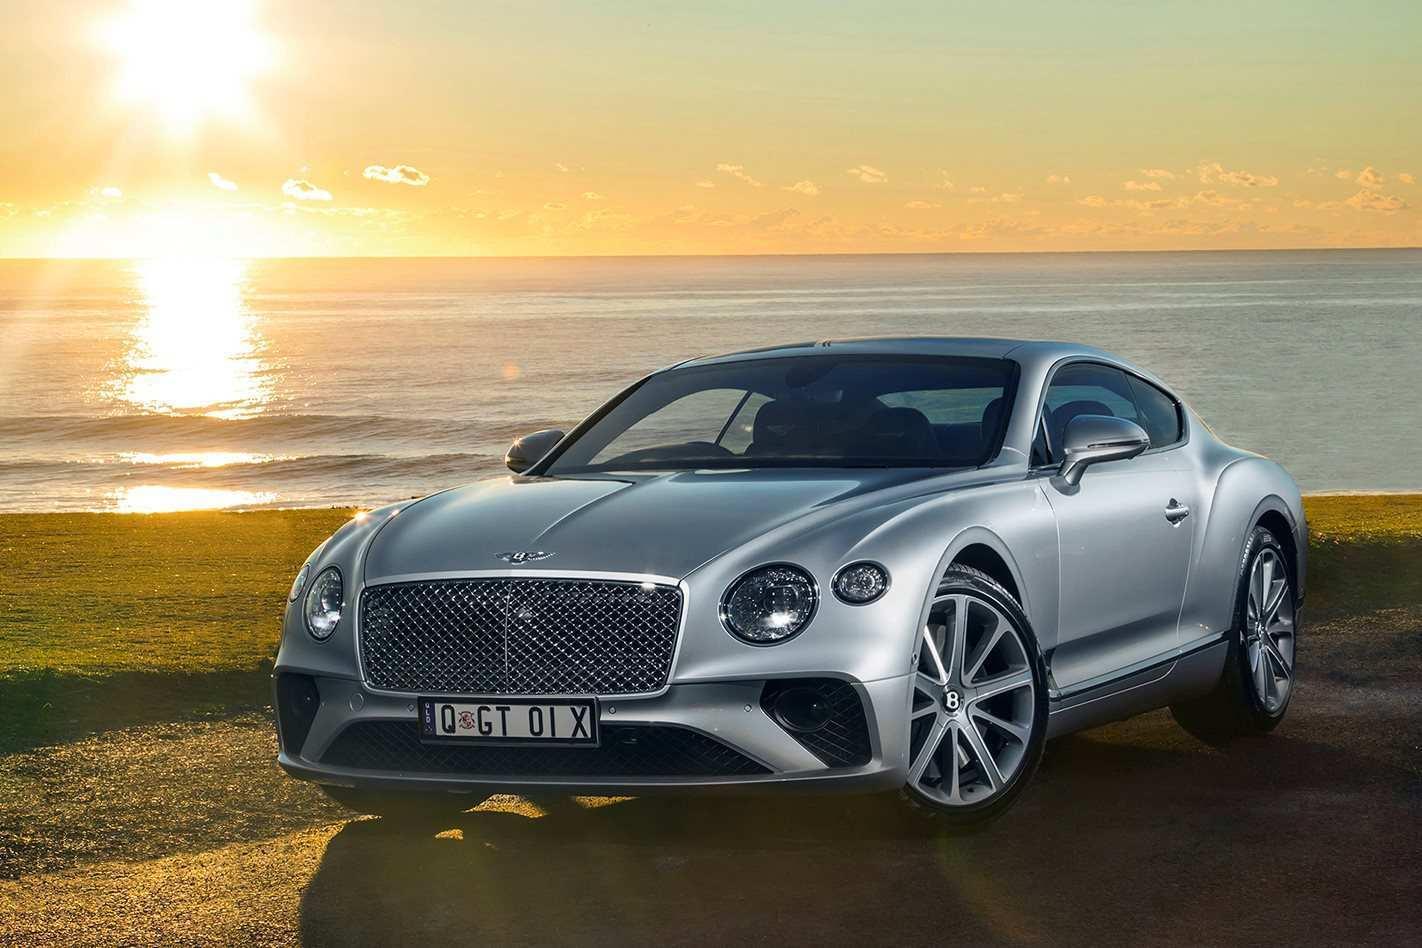 28 Best Review 2019 Bentley Continental Gt Weight Style by 2019 Bentley Continental Gt Weight